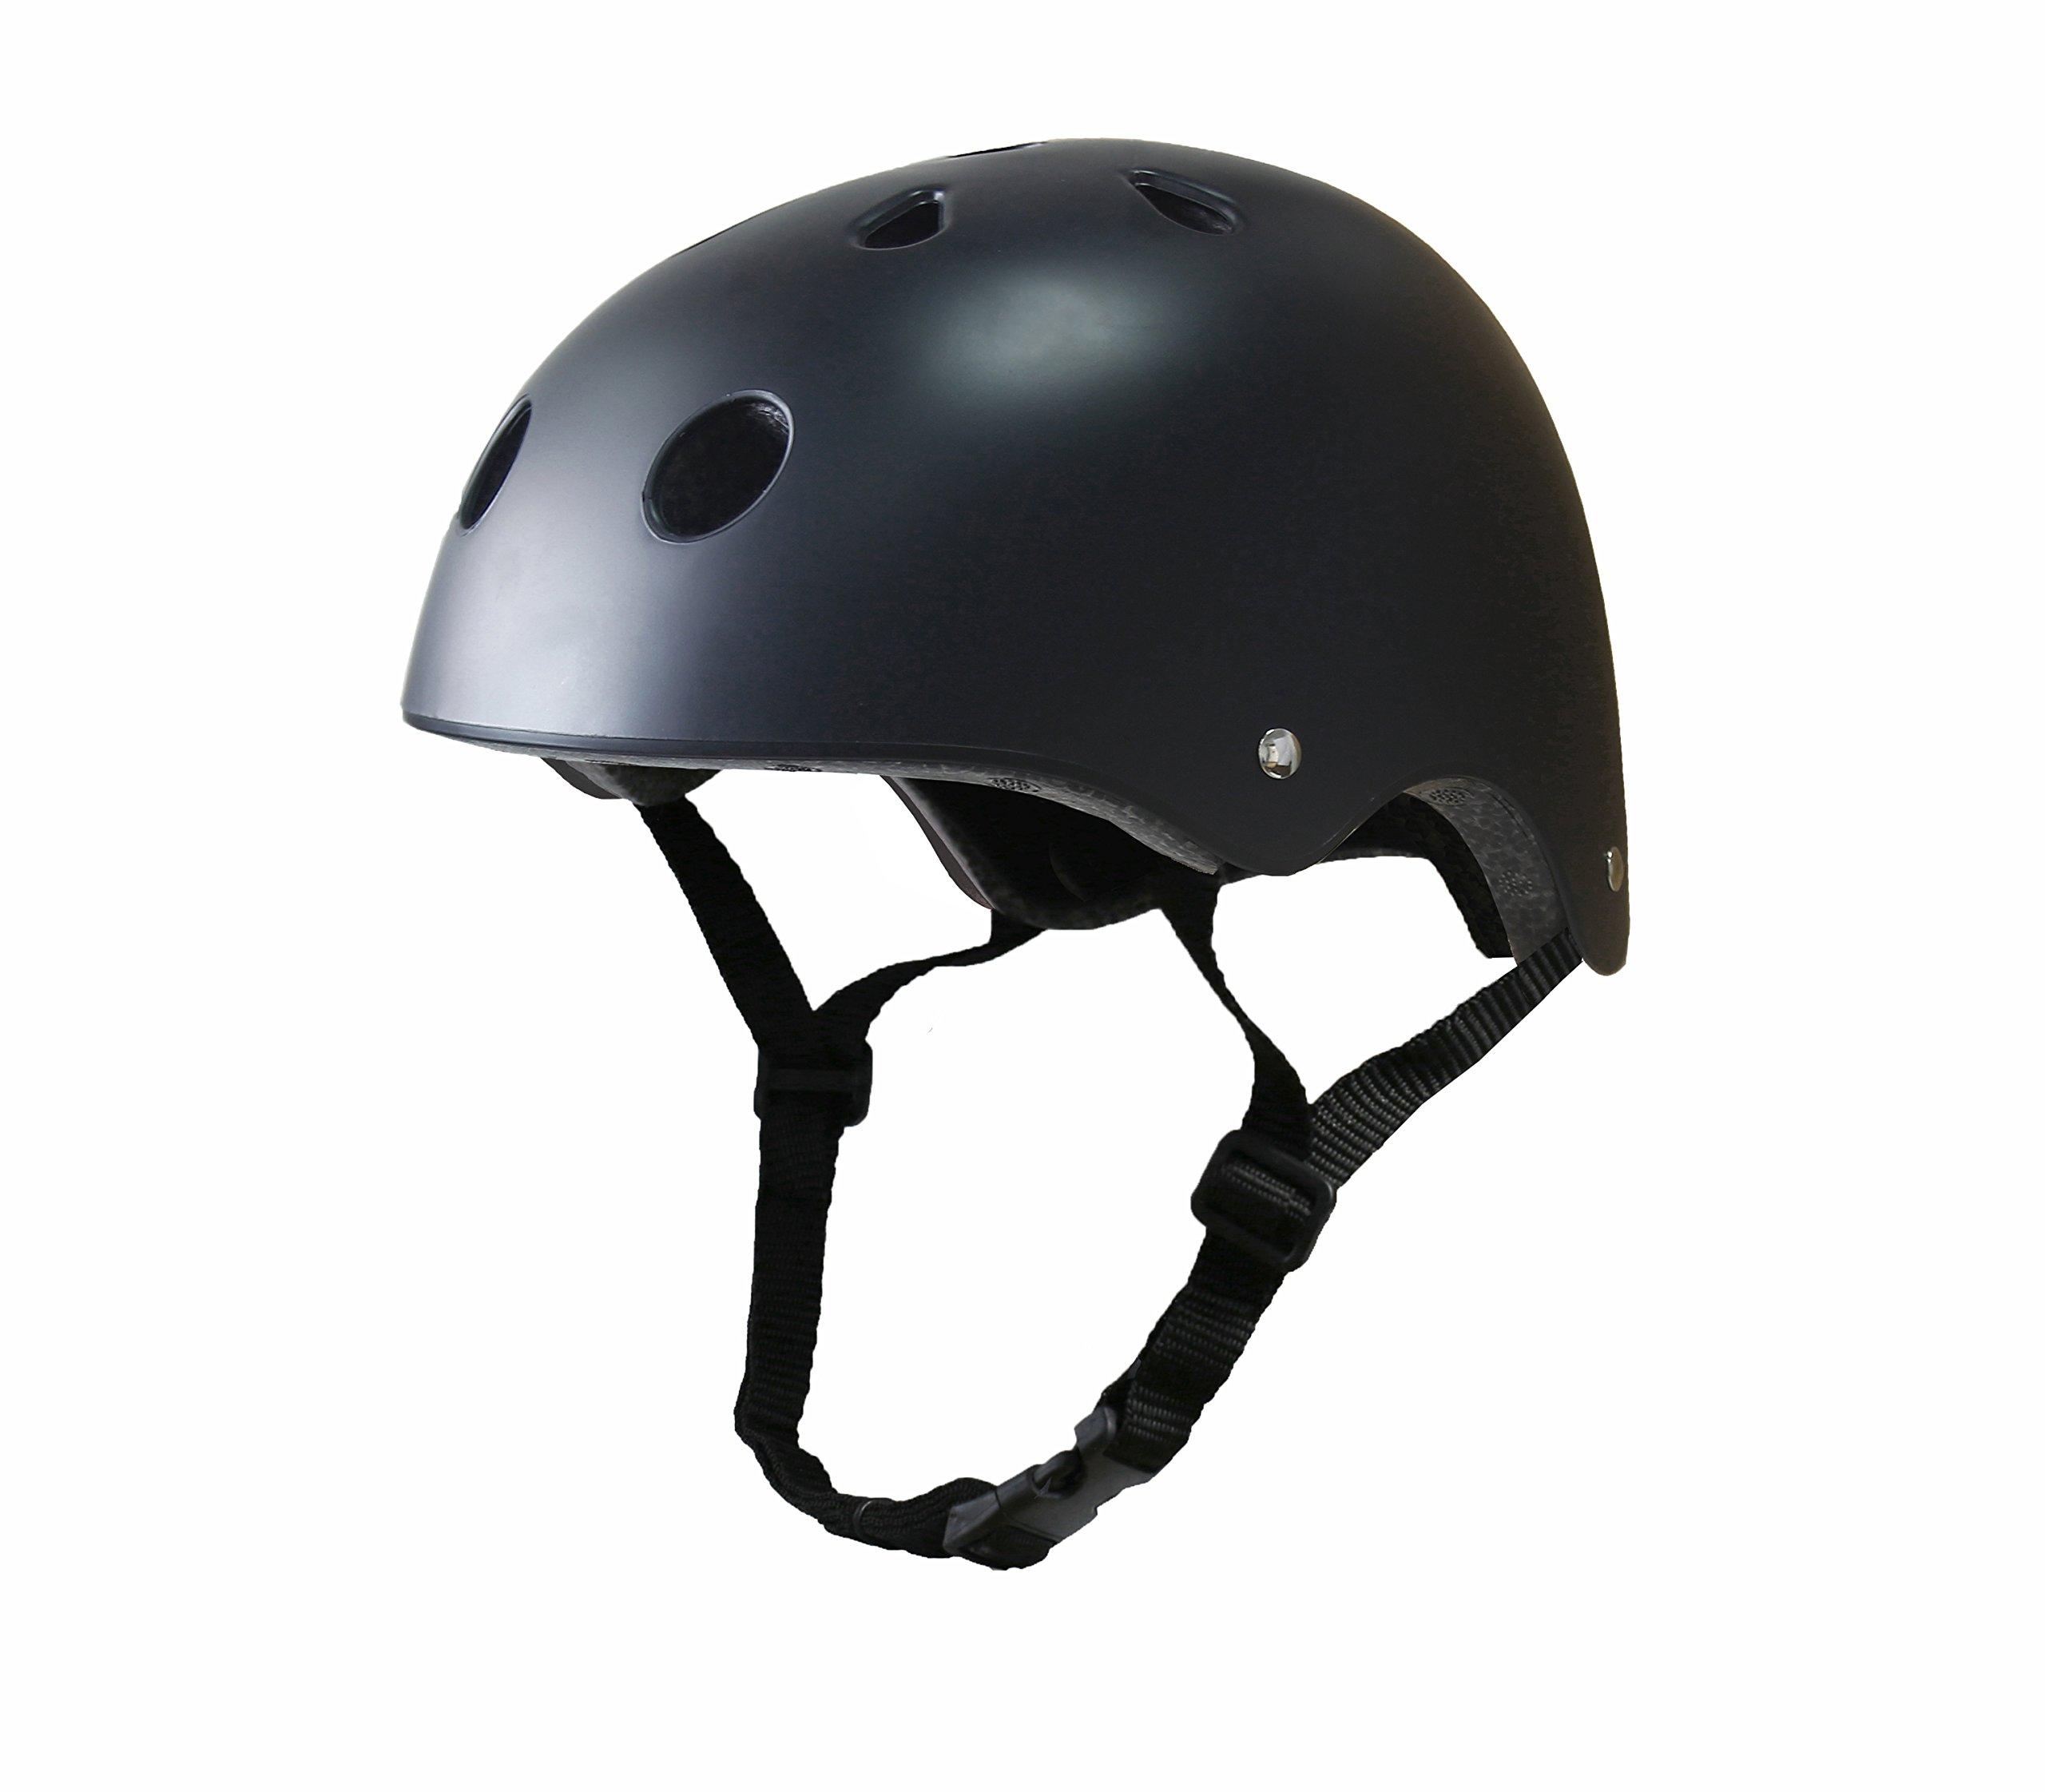 Tourdarson Adult Skateboard Helmet Specialized Certified Protection Sport for Scooter Skate Skateboarding Cycling (Matte Black,Large)